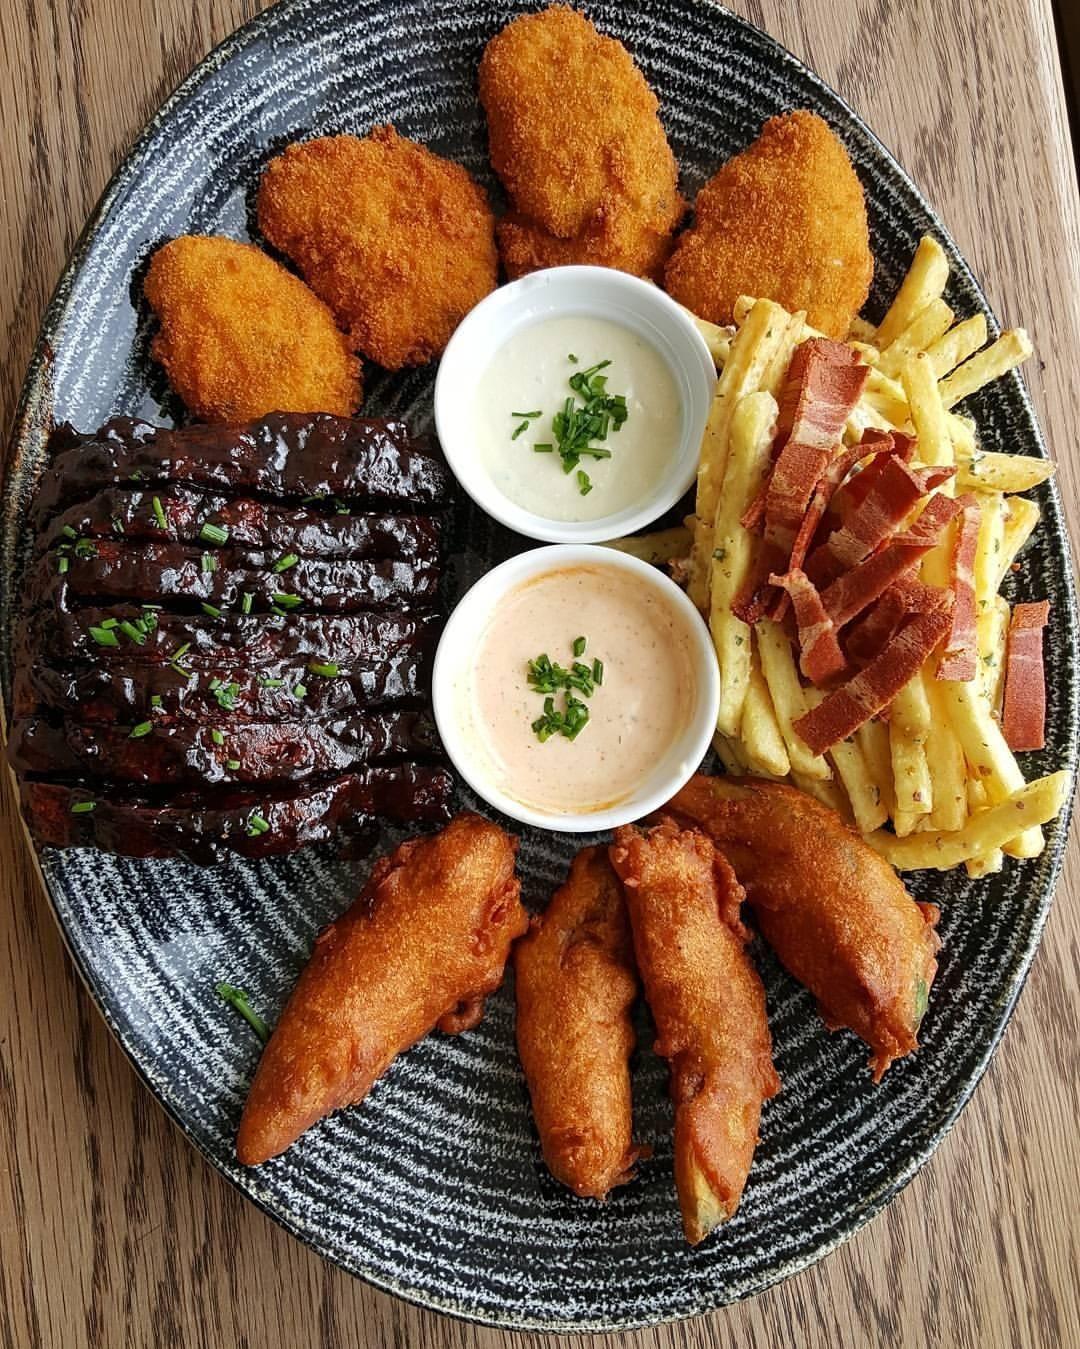 Hail Seitan How Vegan Food Got Downndirty Meatless